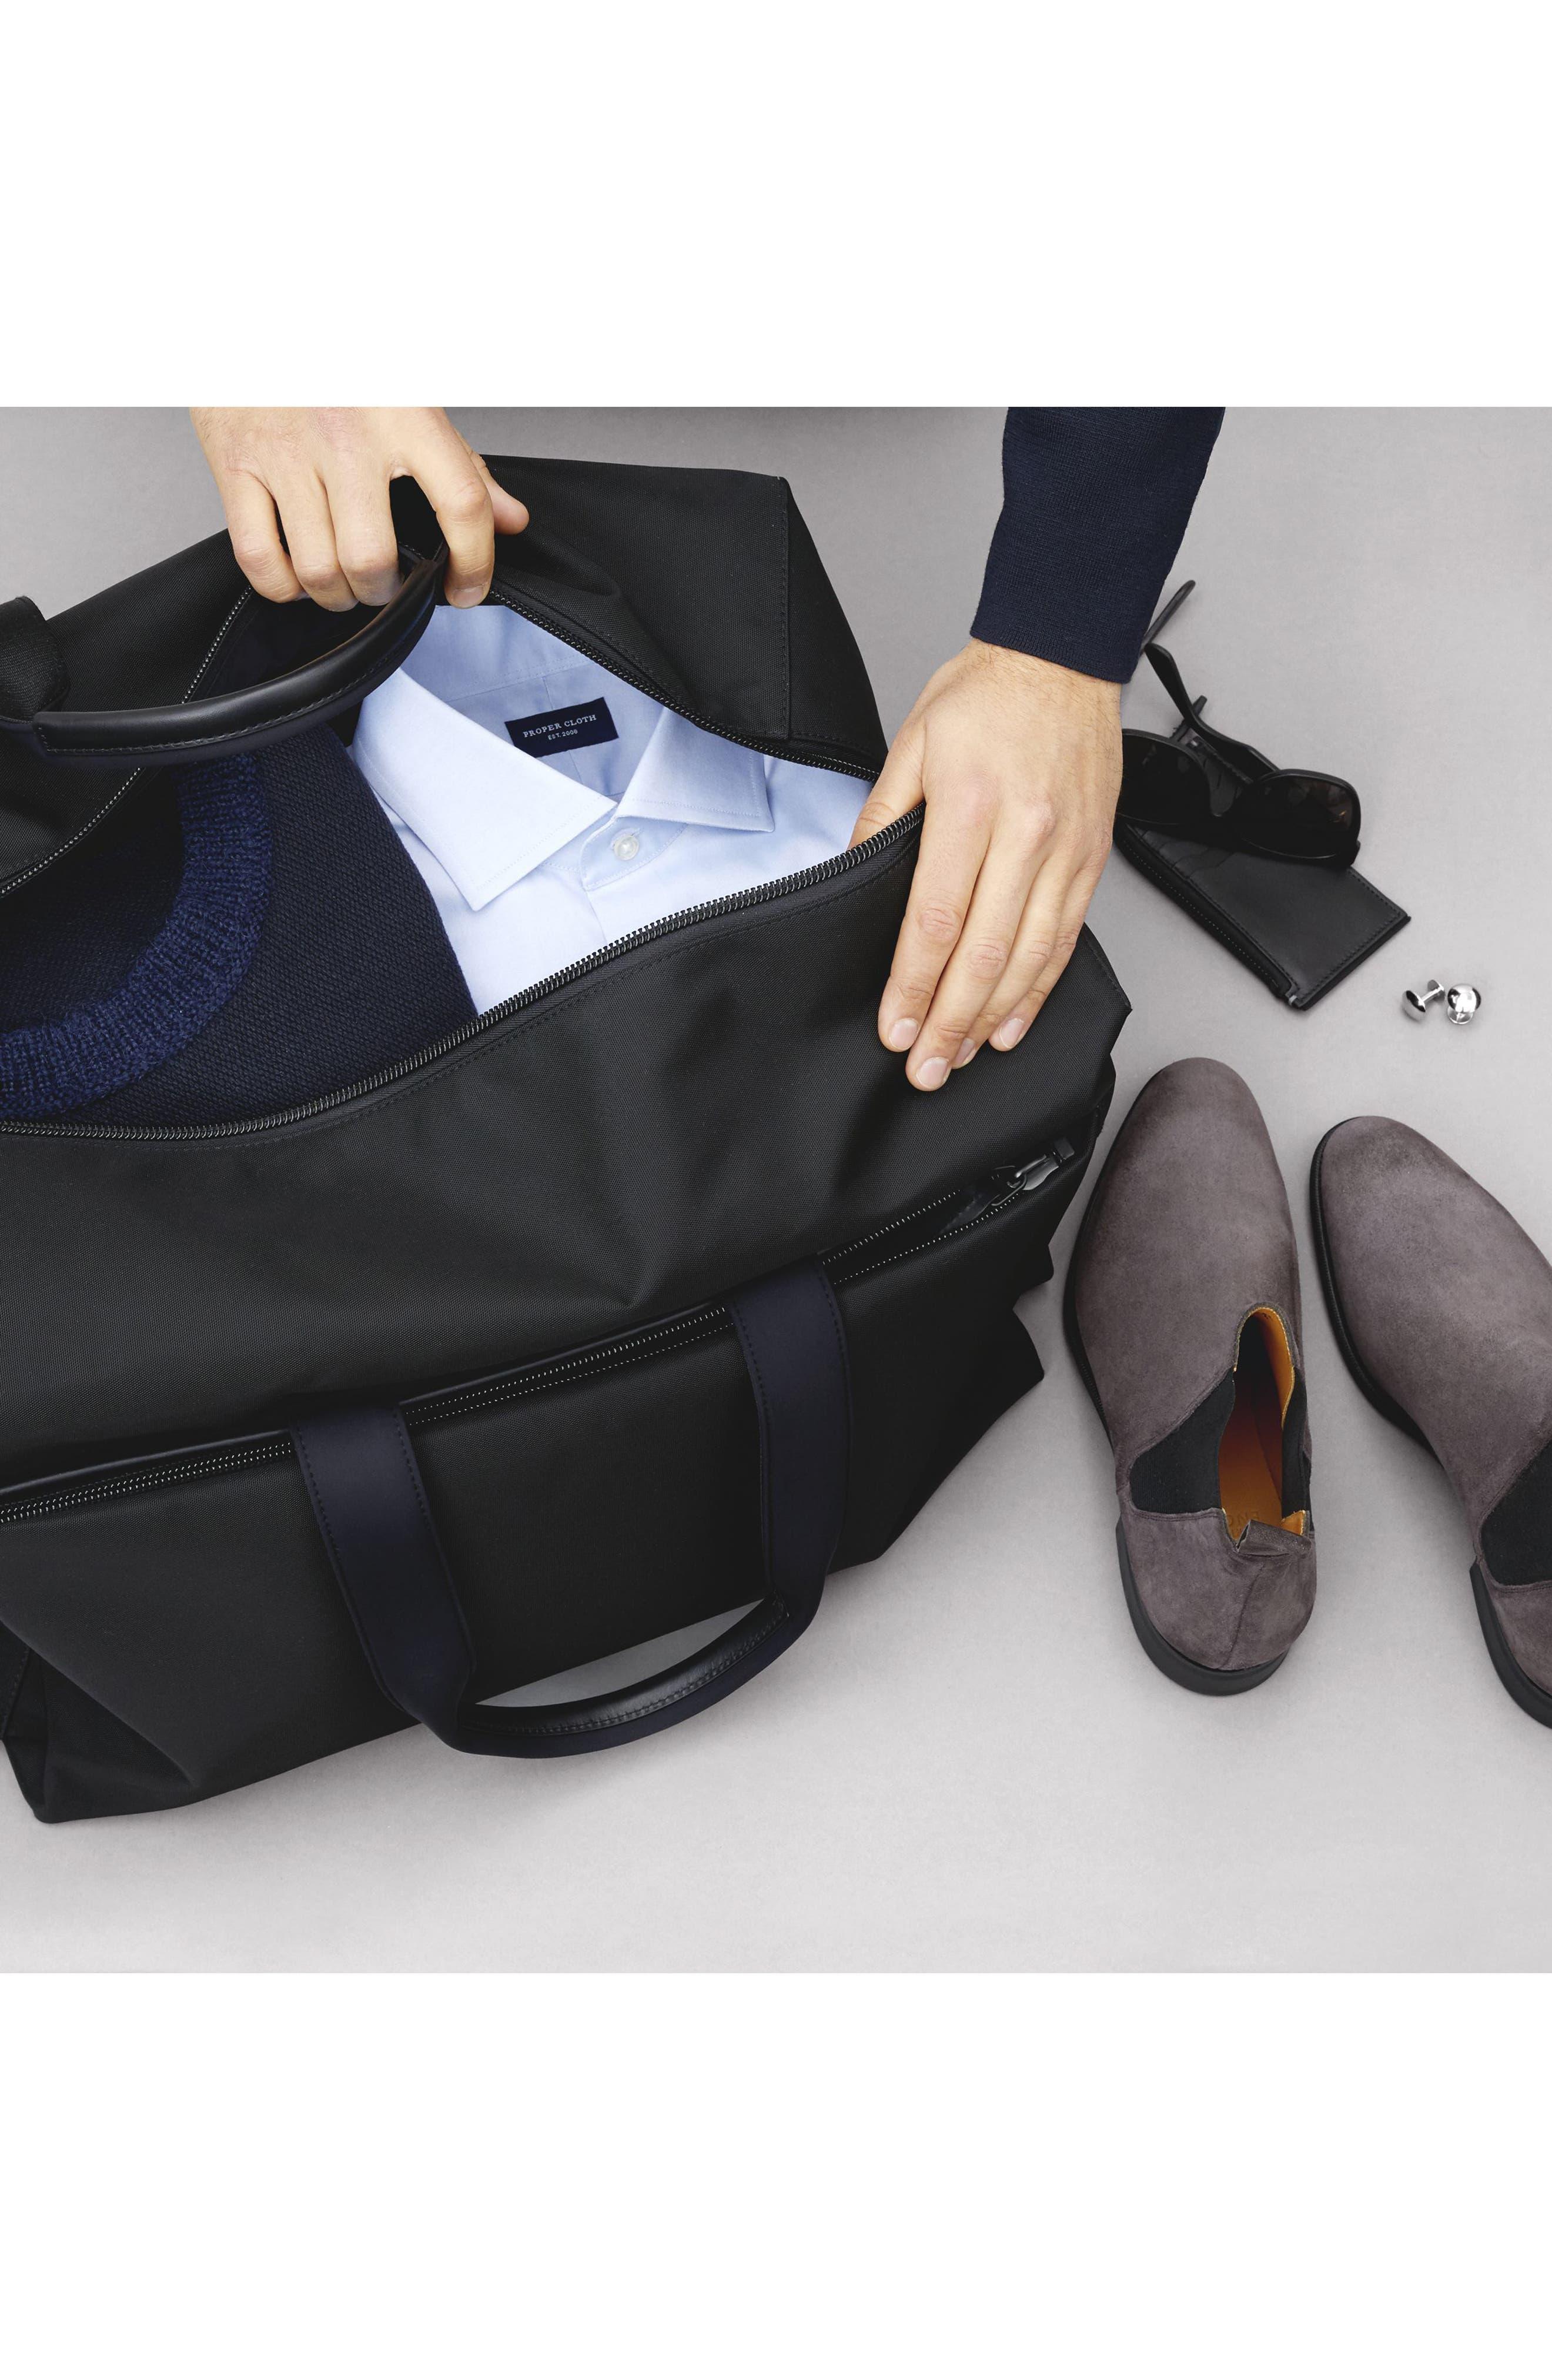 Lightweight Duffel Bag,                             Alternate thumbnail 11, color,                             Black Nylon/ Black Leather